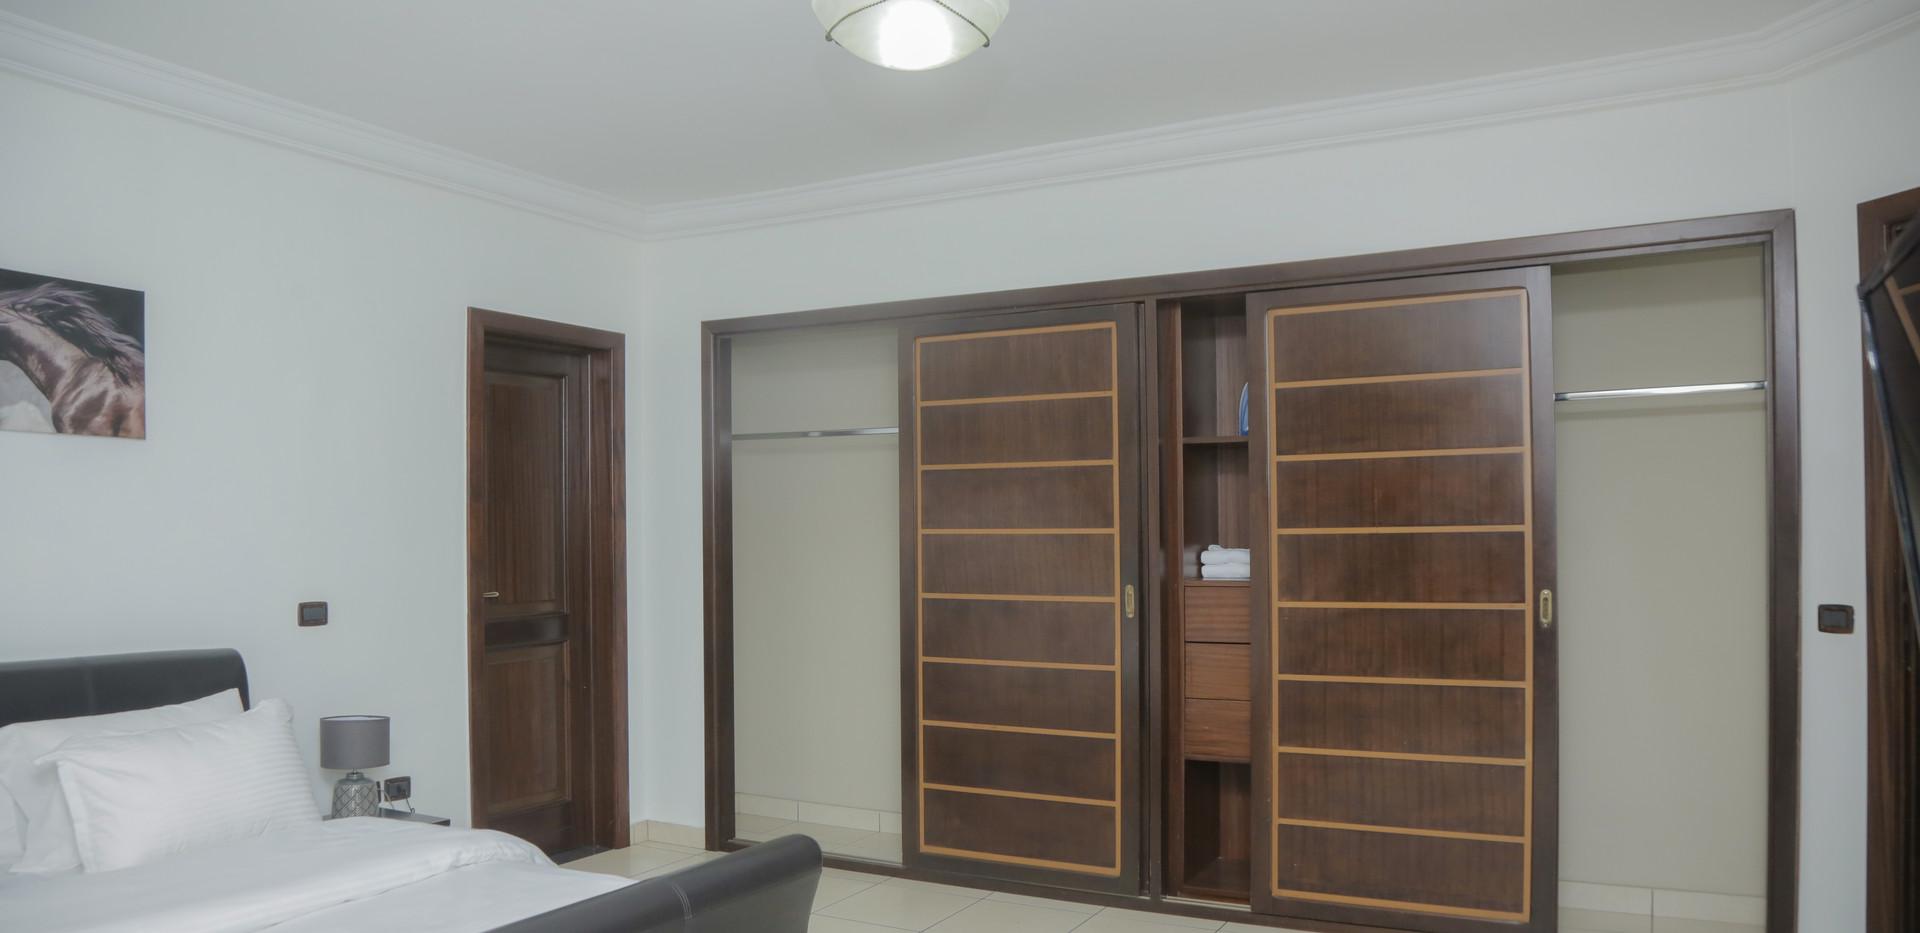 Apartments-33.JPG